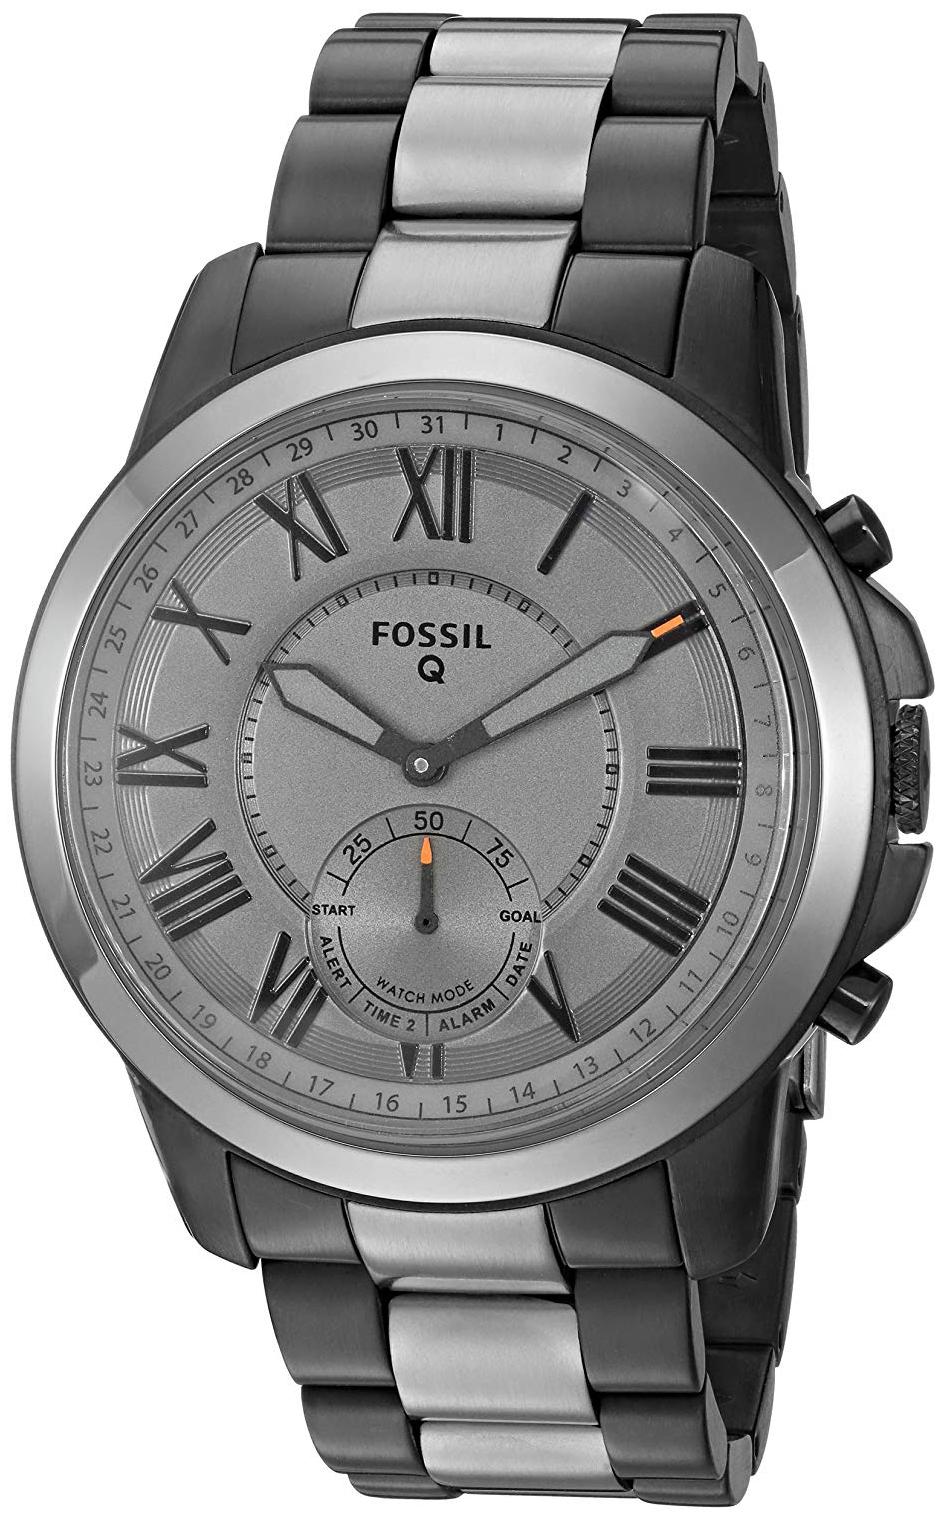 Fossil 99999 Herreklokke FTW1139 Grå/Stål Ø44 mm - Fossil